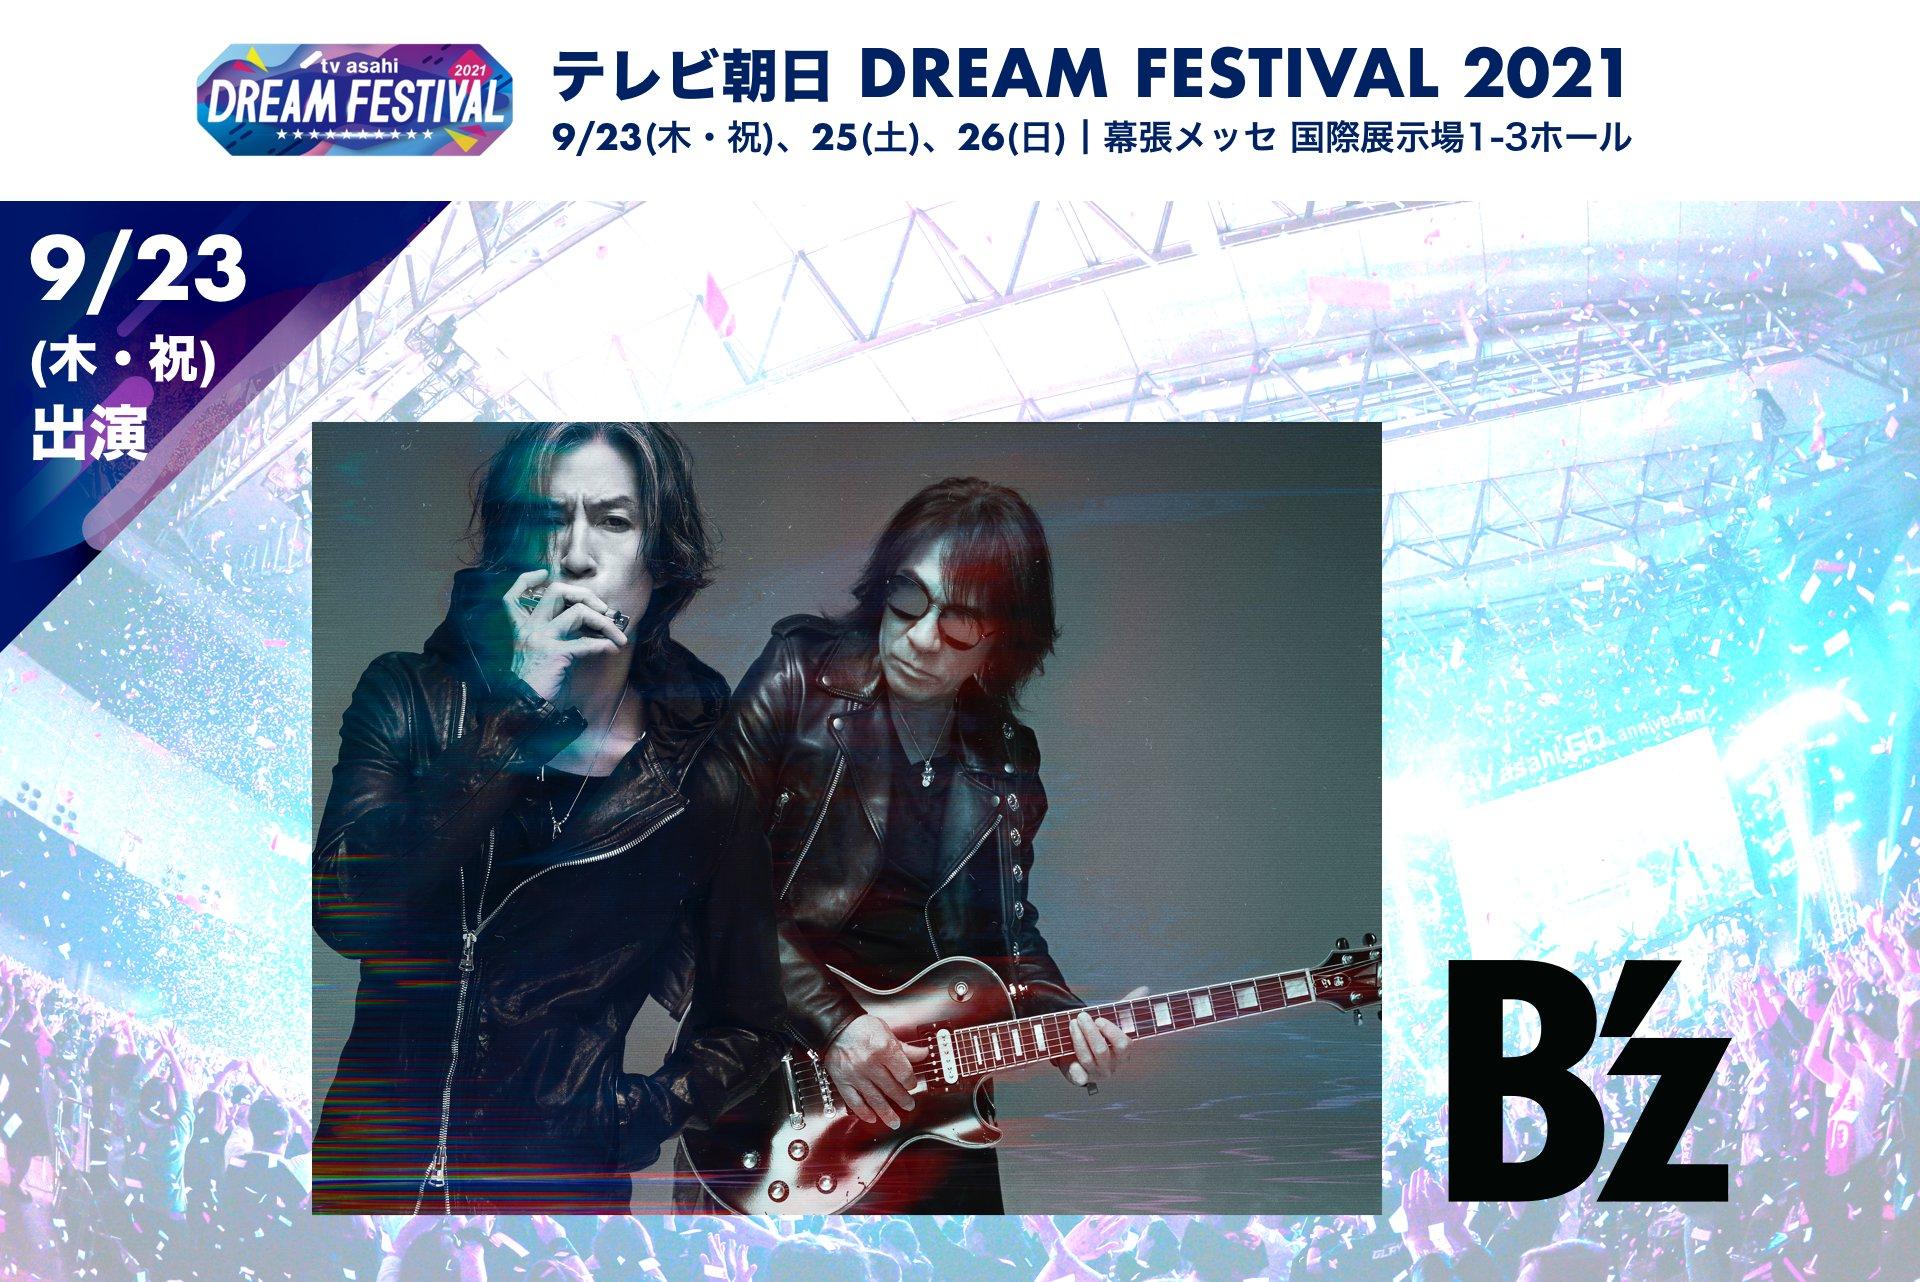 B'zの『テレビ朝日ドリームフェスティバル2021』出演決定を知らせる画像